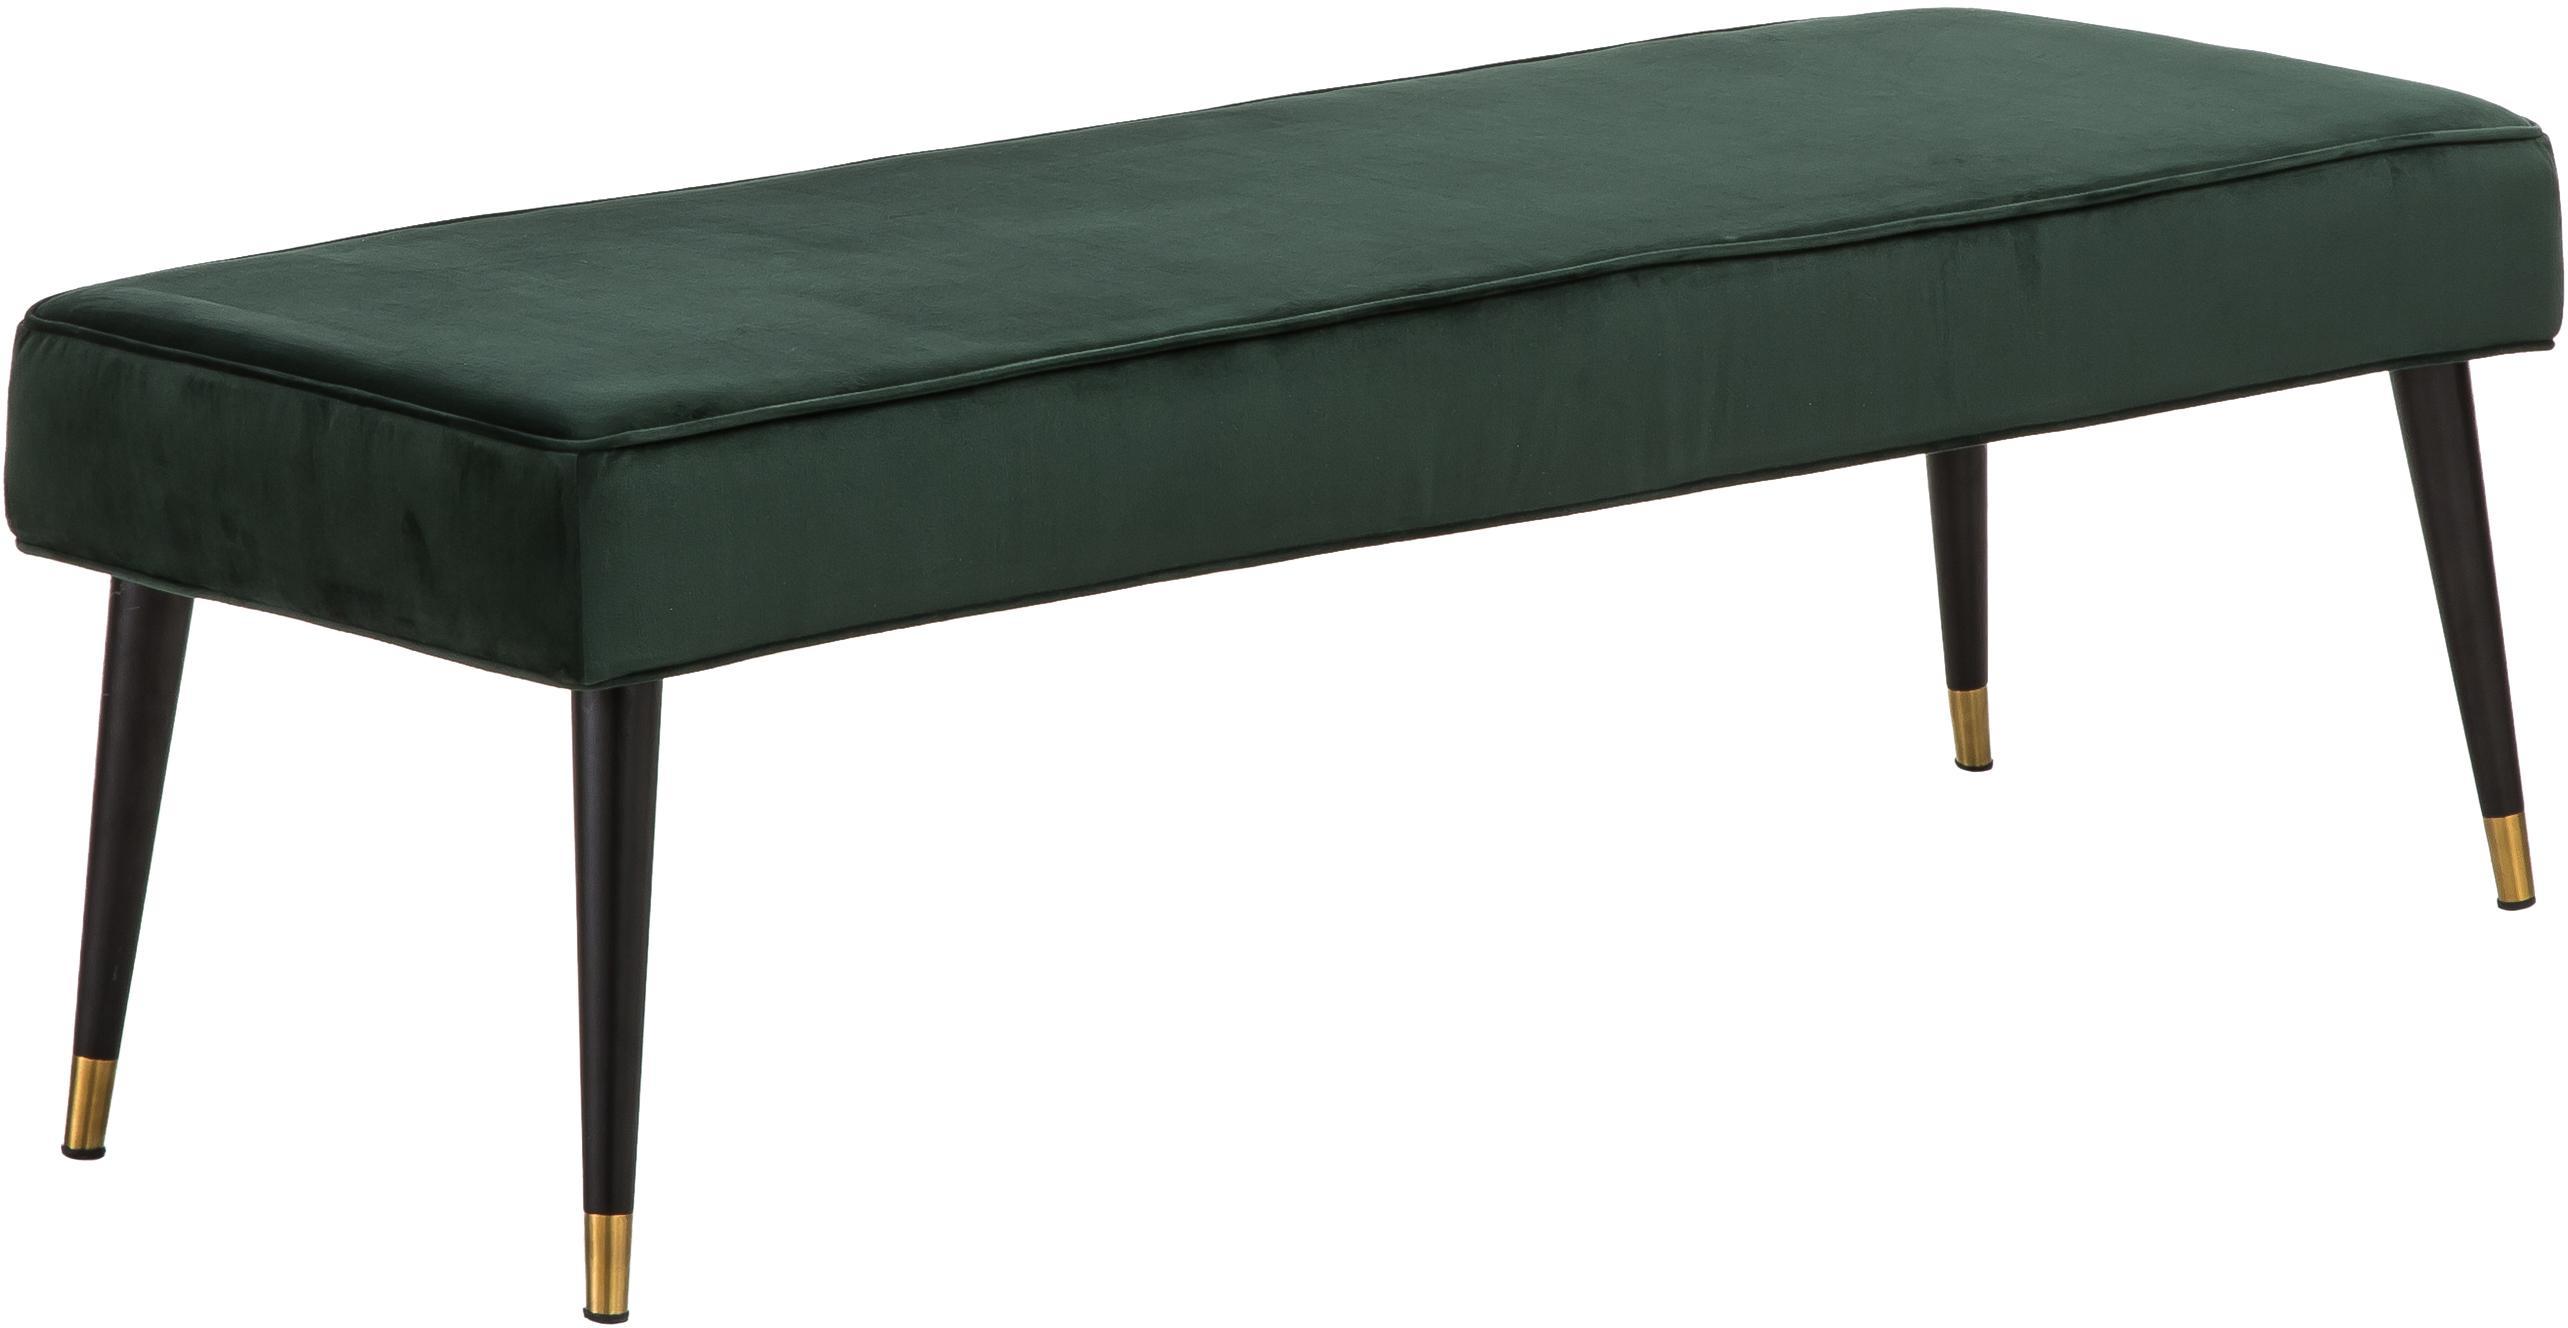 Fluwelen bank Beverly, Bekleding: fluweel (polyester), Frame: eucalyptushout, Poten: gepoedercoat metaal, Donkergroen, 140 x 46 cm